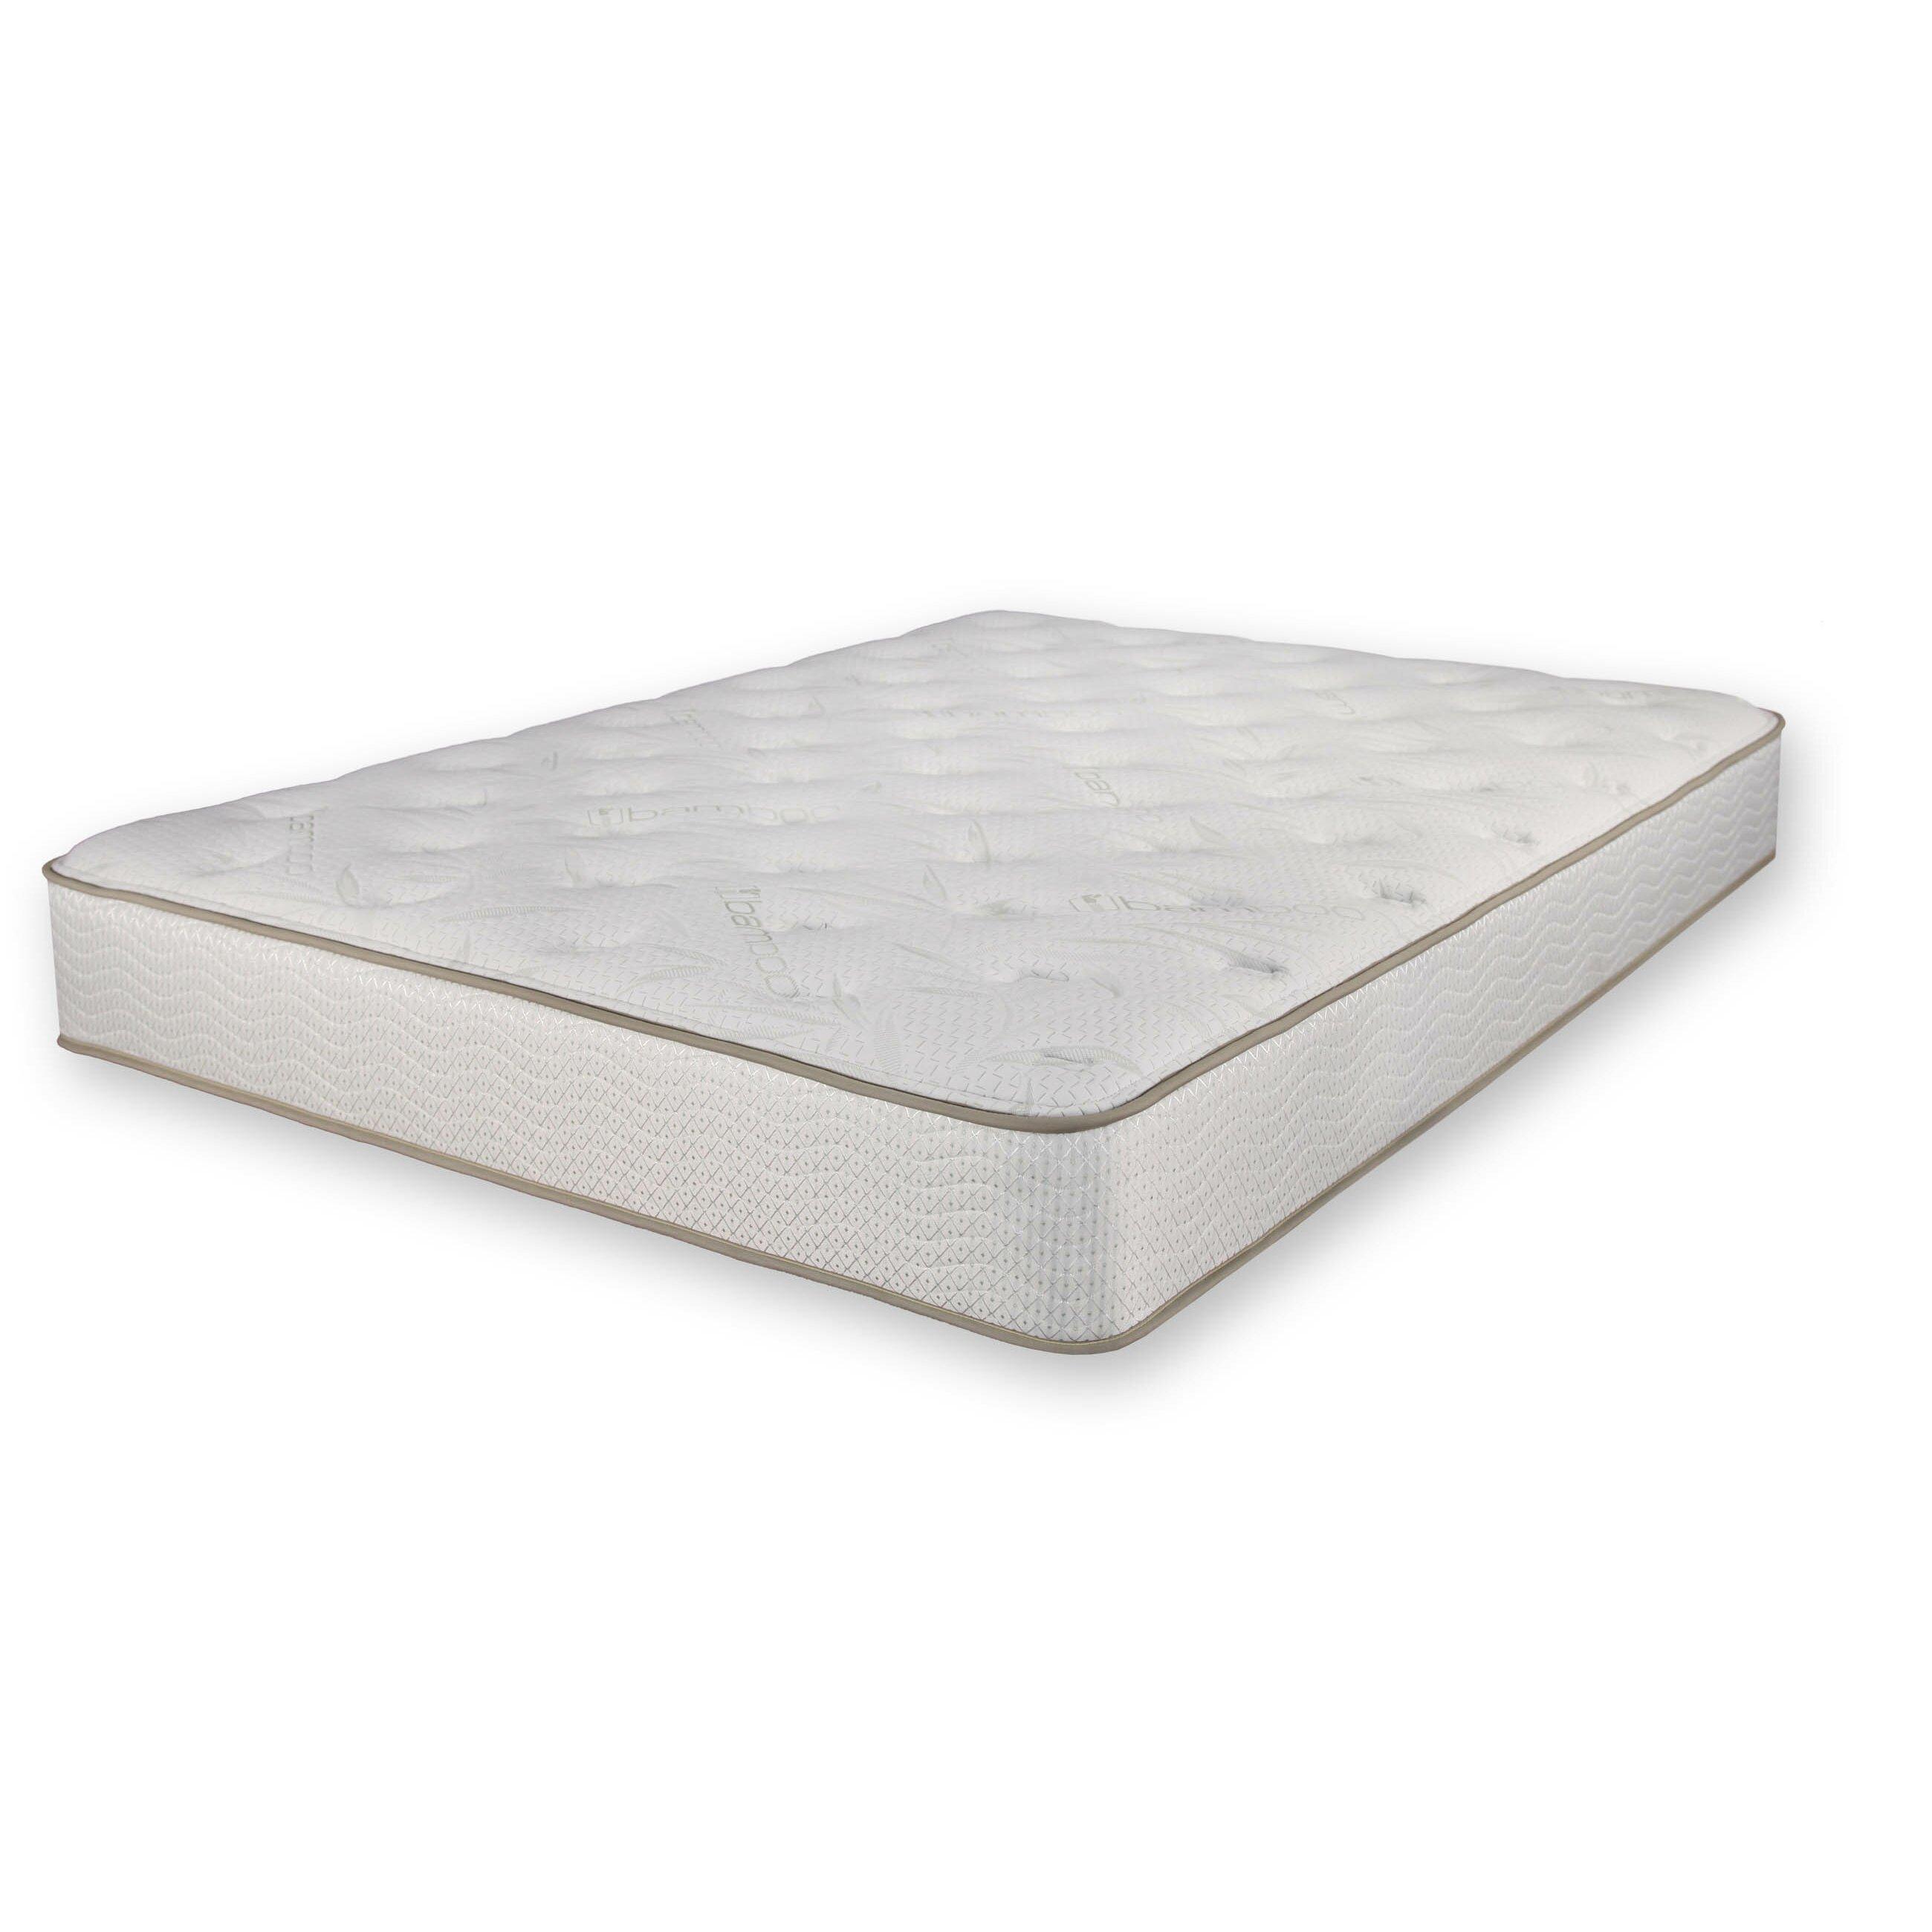 Brooklyn bedding ultimate dreams 10quot ultra plush natural for Brooklyn bedding mattress reviews